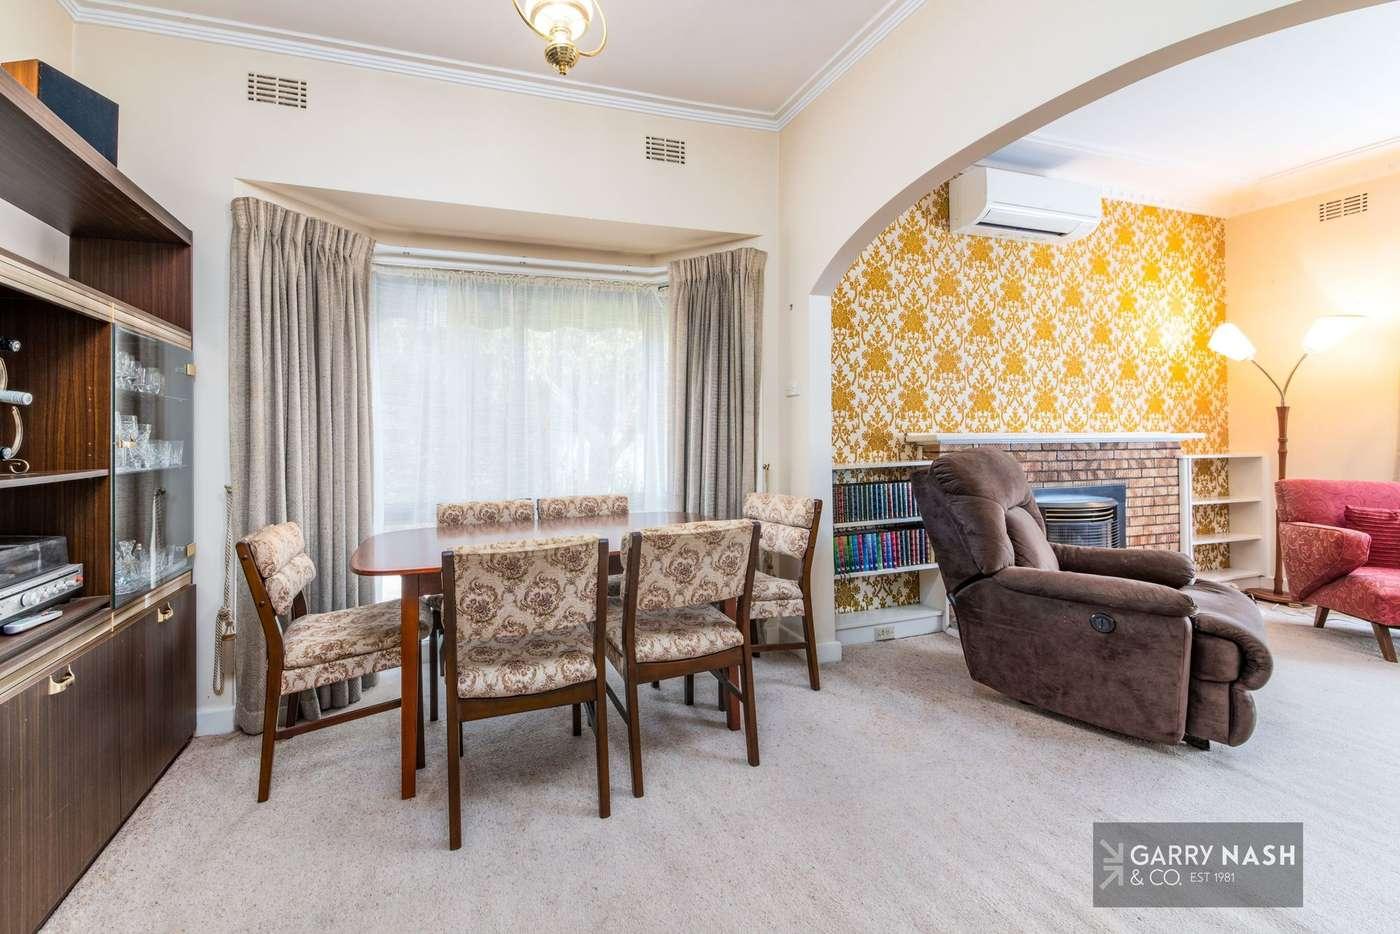 Seventh view of Homely house listing, 19 Larkings Street, Wangaratta VIC 3677